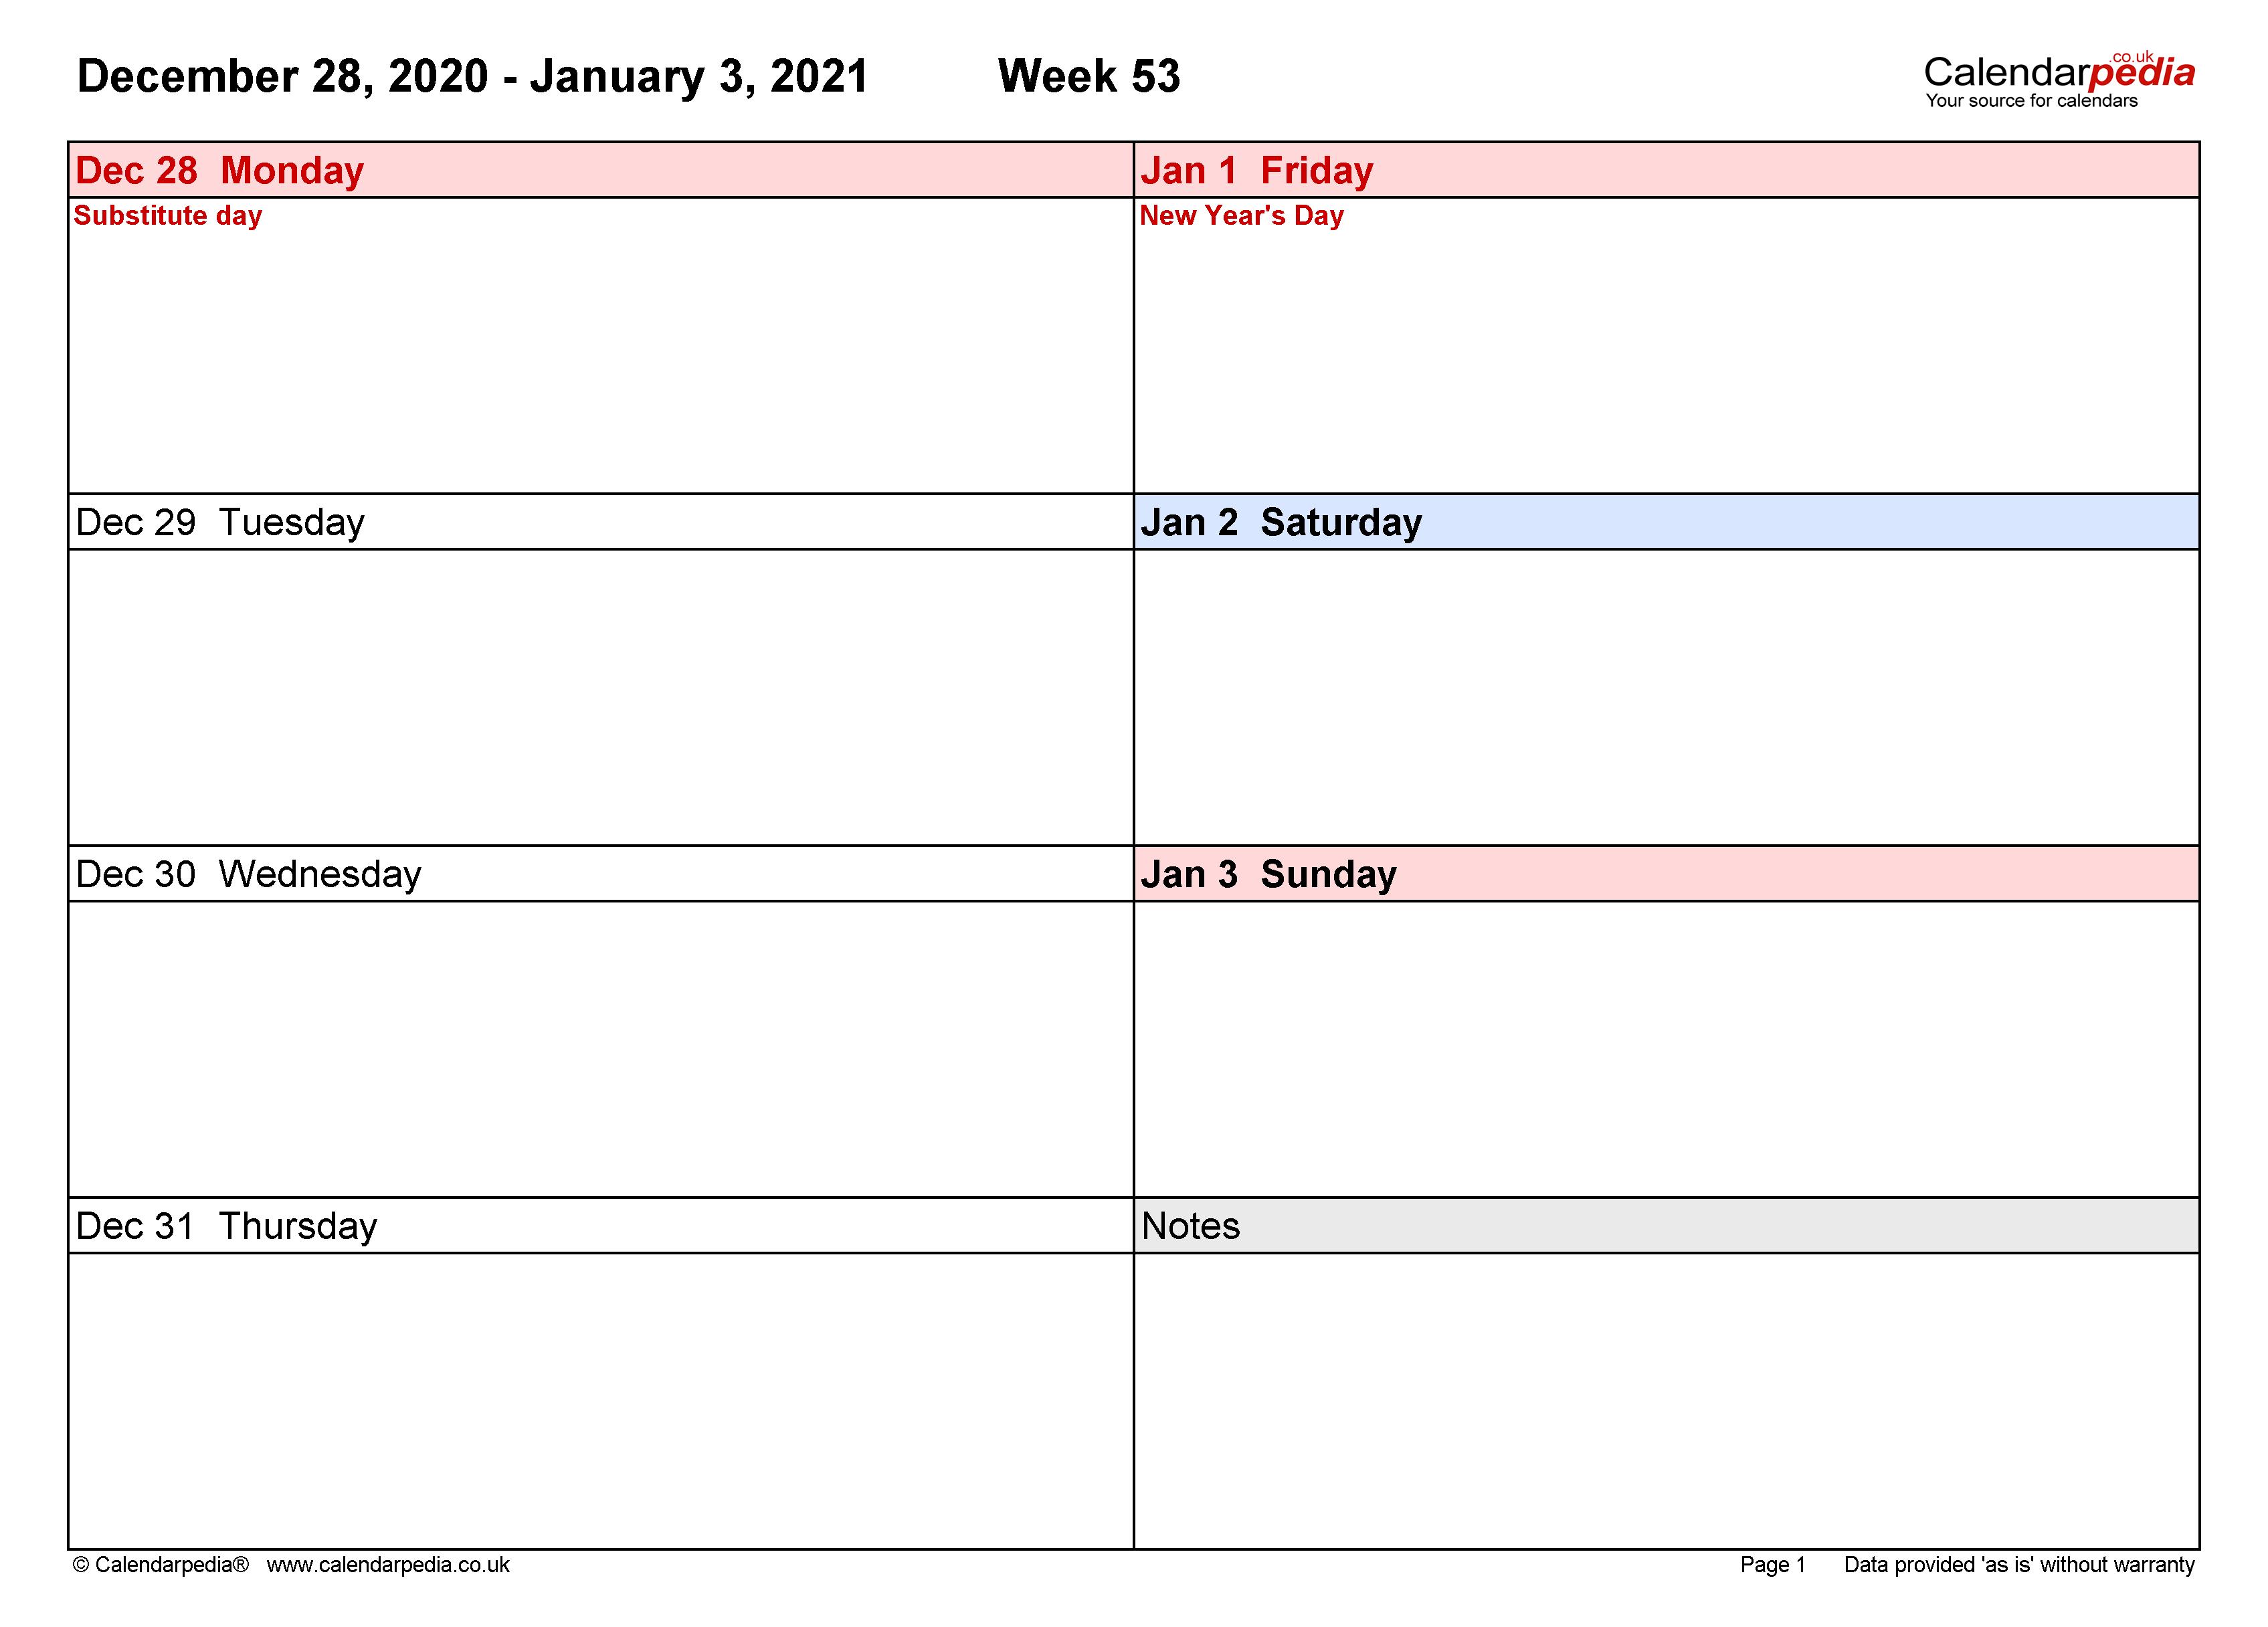 Free Editable Weekly 2021 Calendar - Calendar 2021 (UK ...